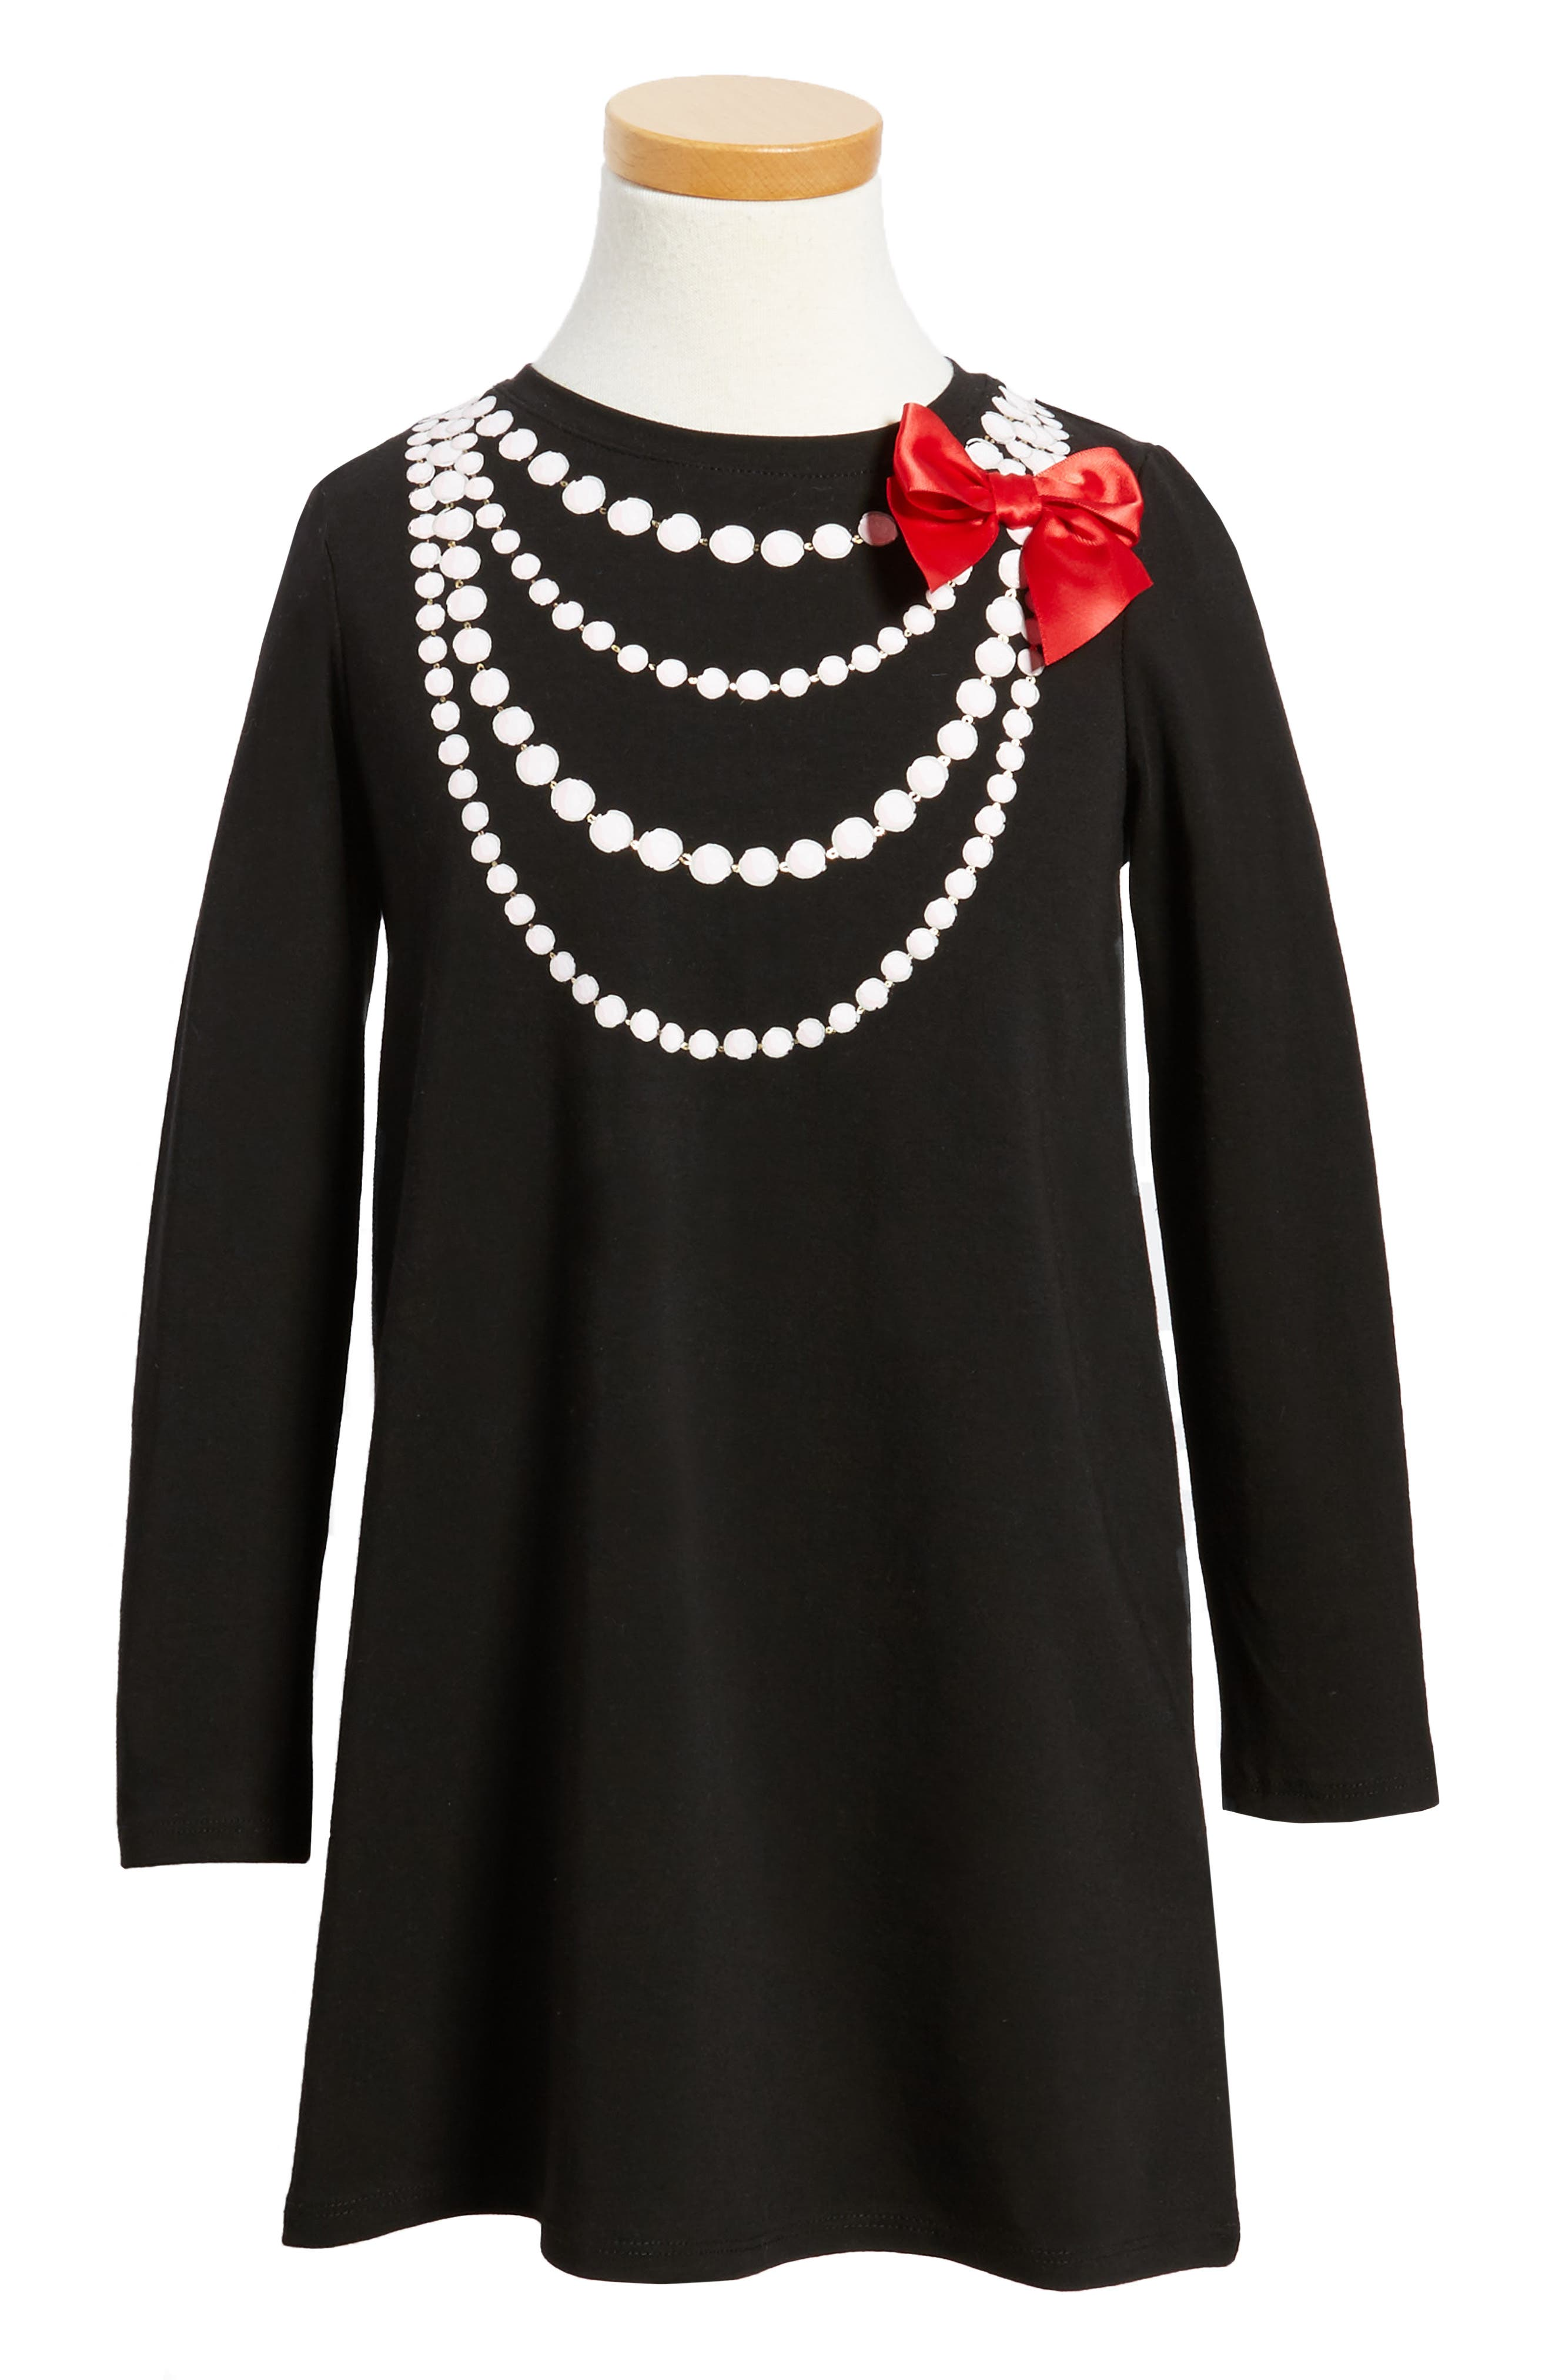 kate spade new york trompe l'oeil dress (Toddler Girls & Little Girls)